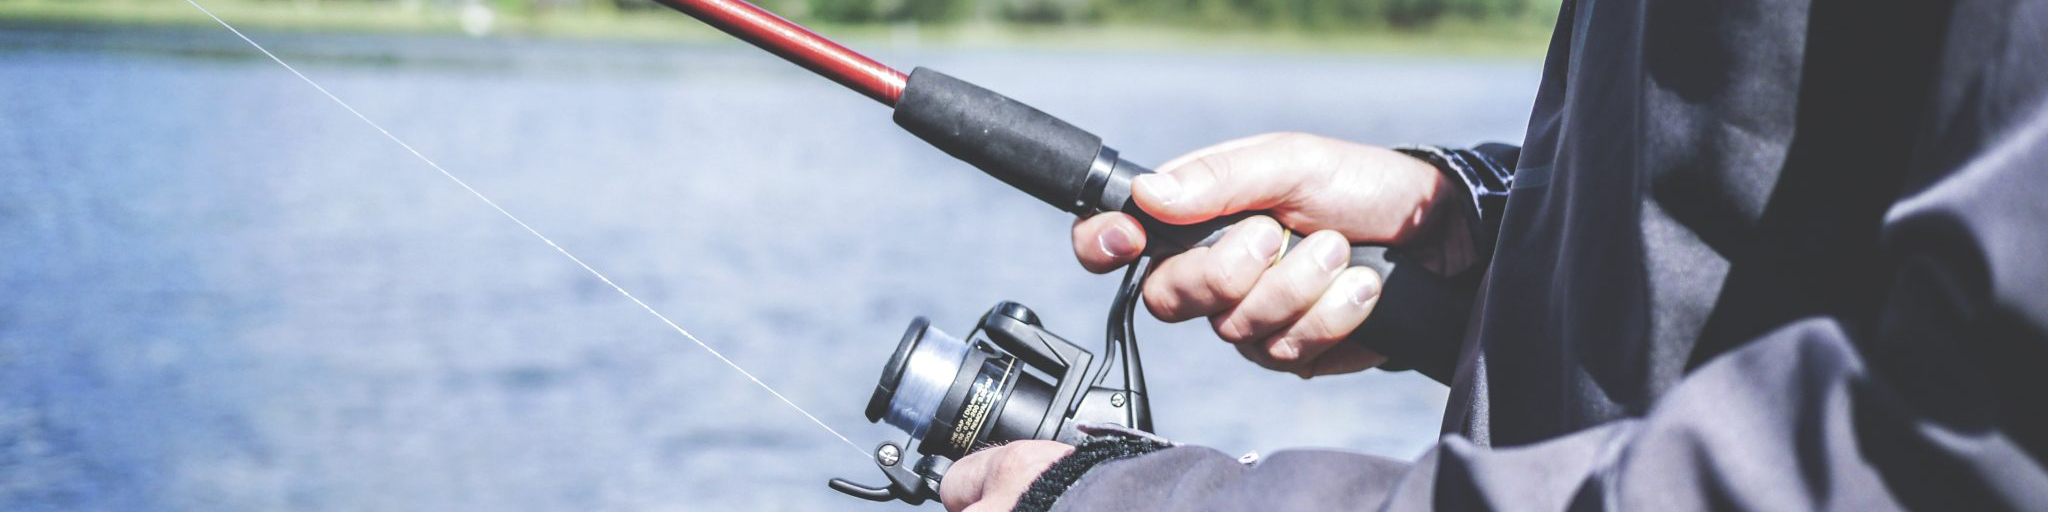 Nieuws De Oirschotse Sportvissers